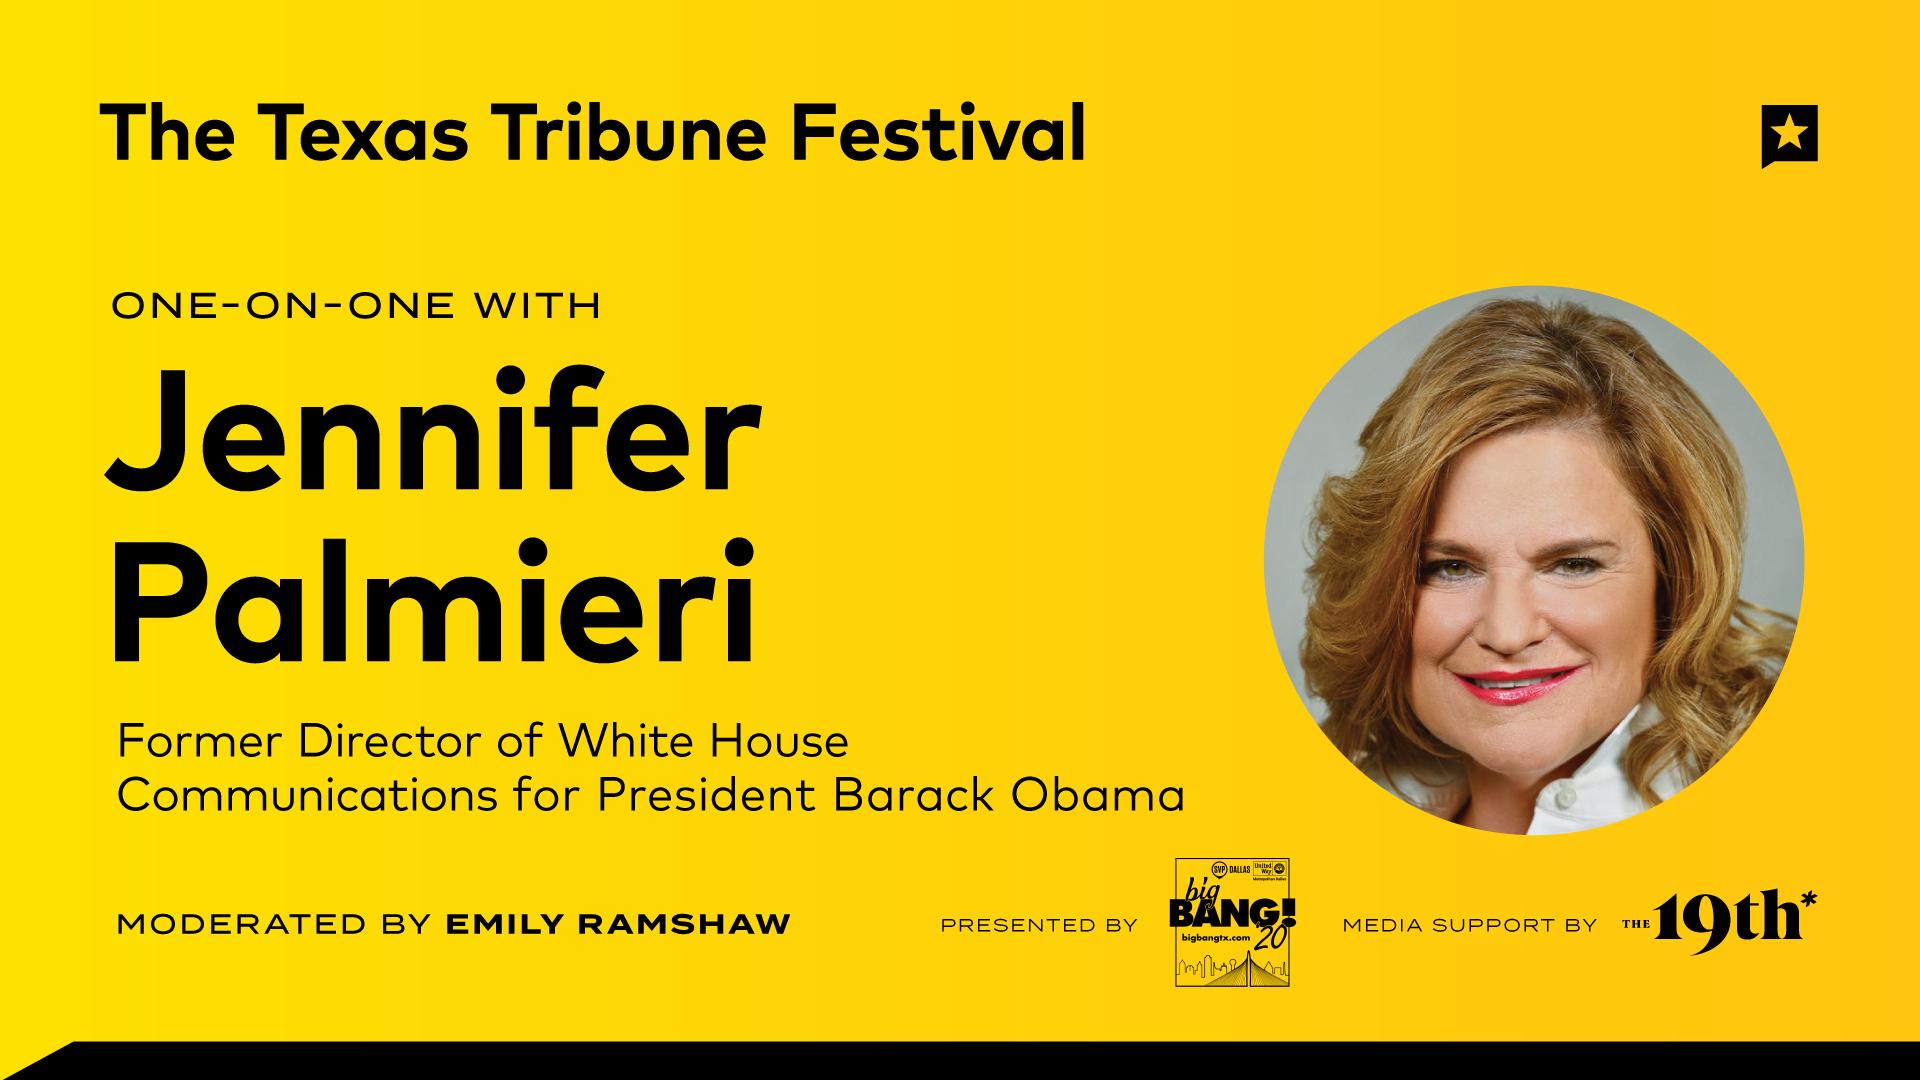 One-on-One with Jennifer Palmieri